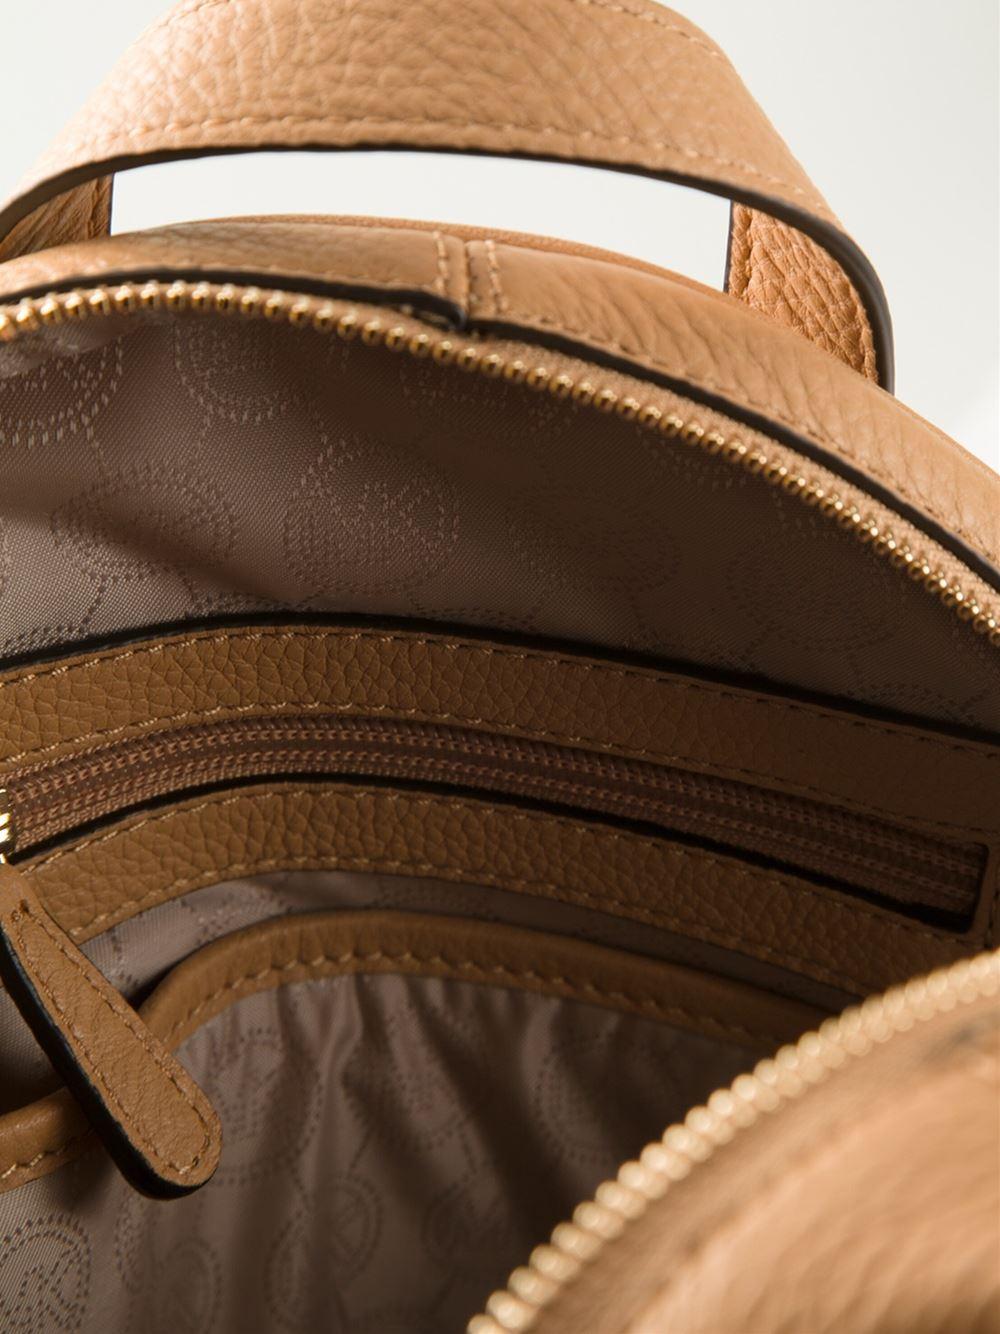 6af8ed911f48 Rhea Zip Medium Bicolor Leather Backpack- Fenix Toulouse Handball